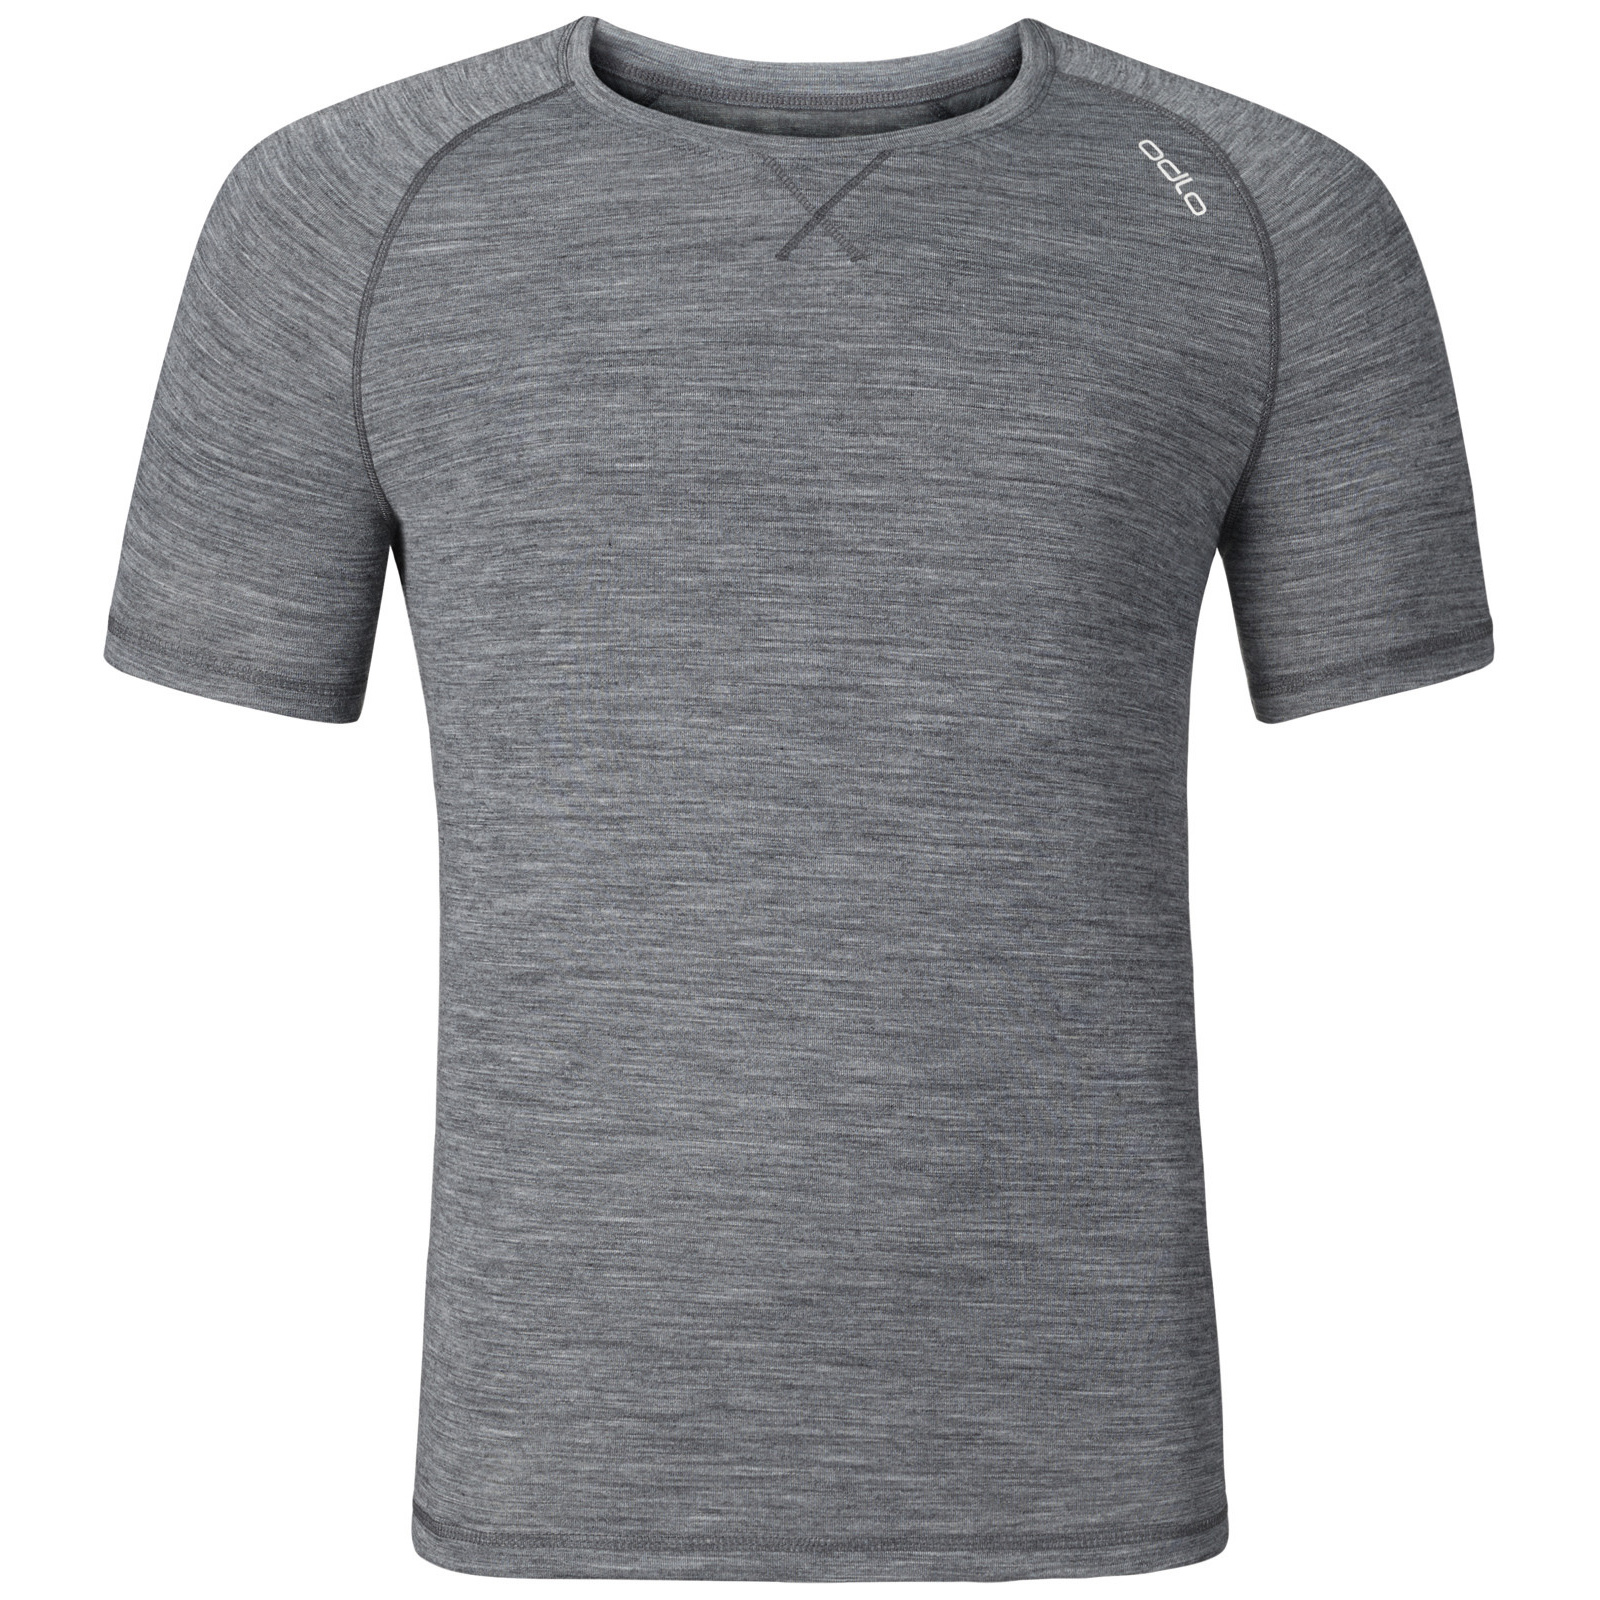 Odlo Revolution Lite S/S Shirt | Grey Melange